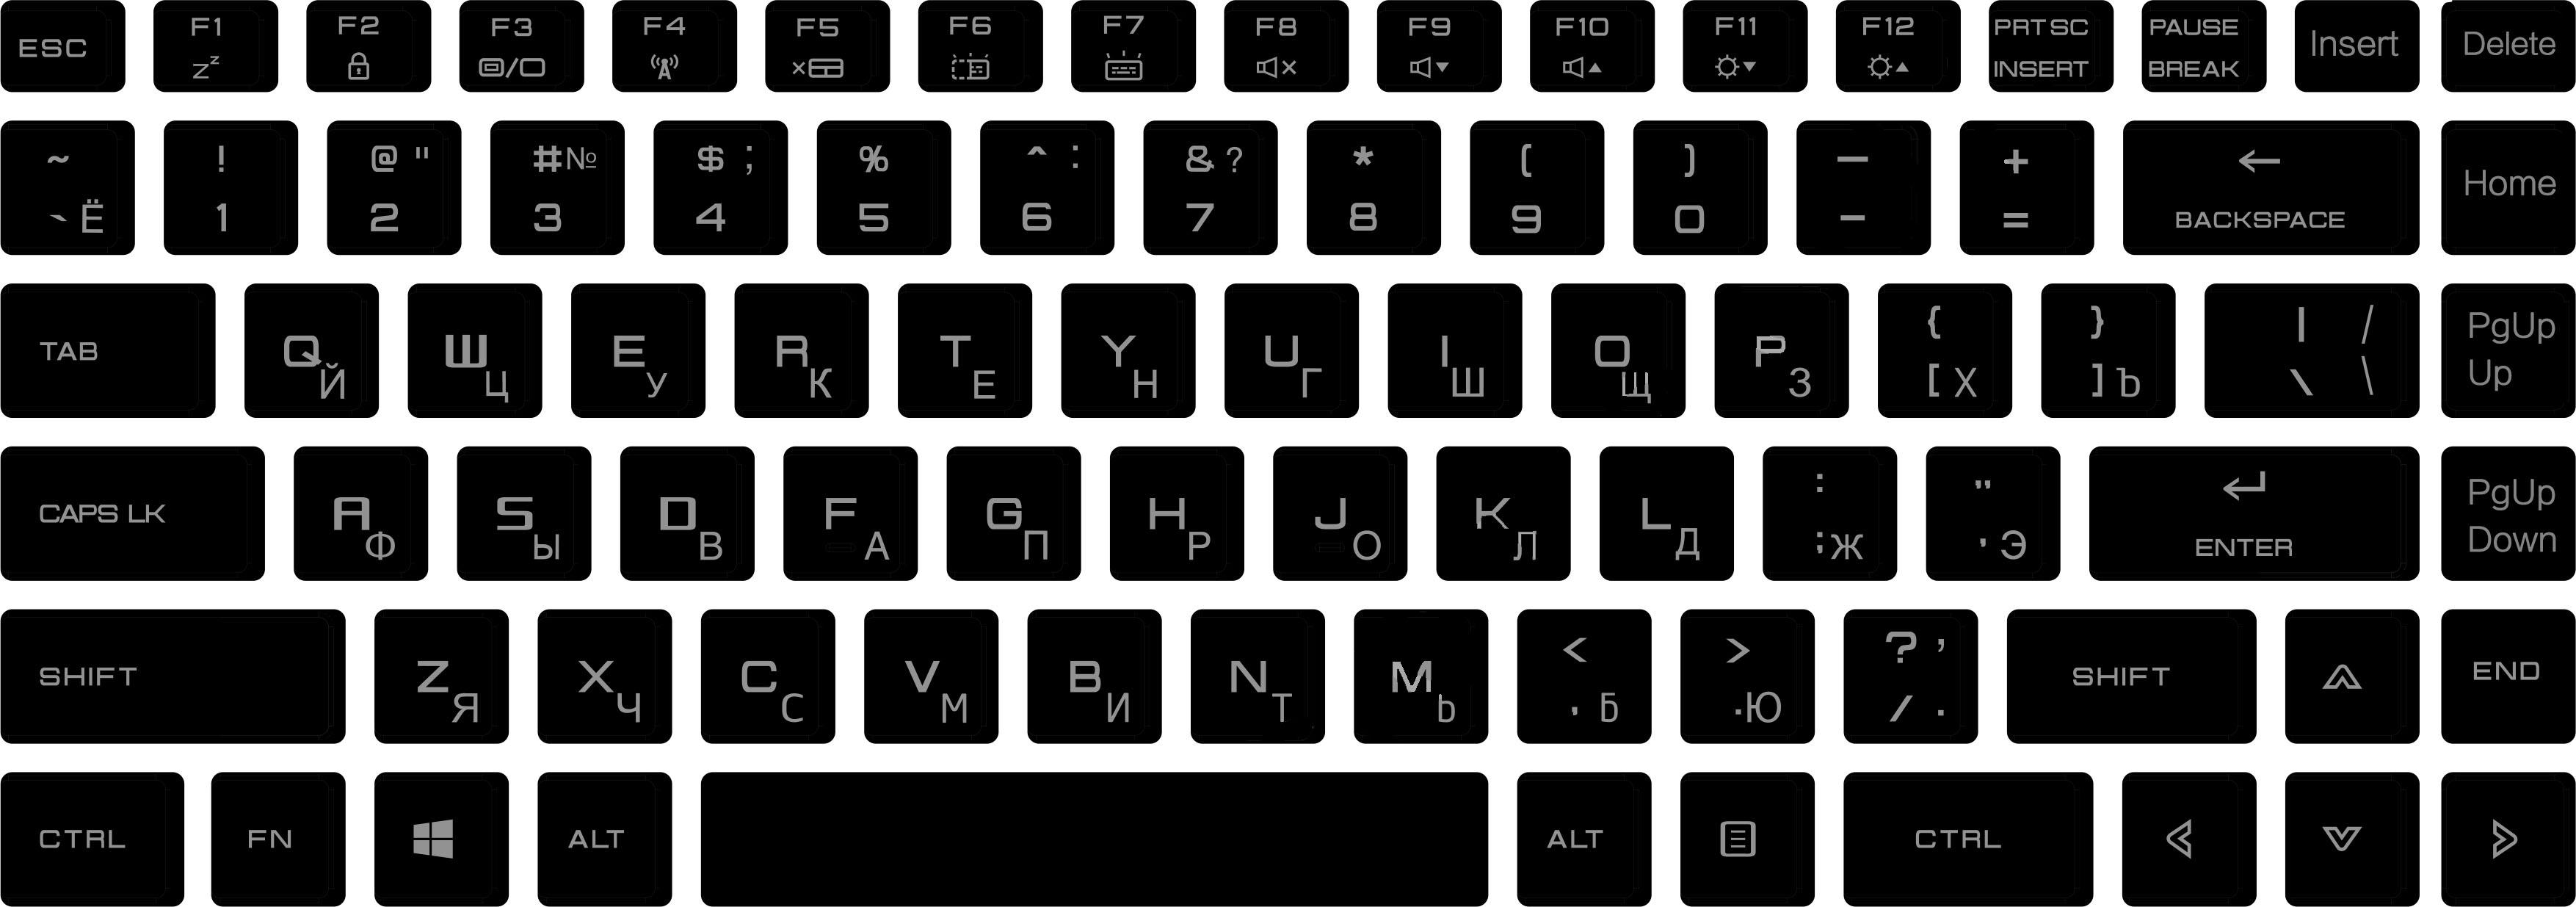 MaiBenBen XiaoMai  Russian Keyboard Cover Hold Sticker Skin-Cover Anti-Dusty Laptop Notebook